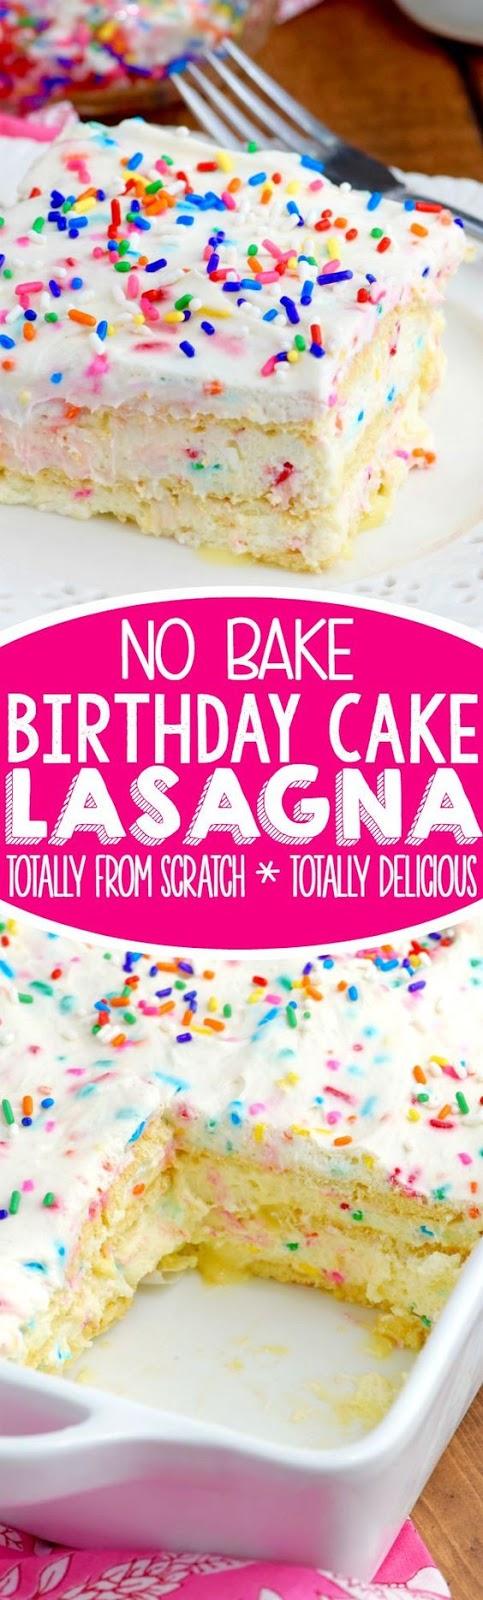 No Bake Birthday Cake Recipes